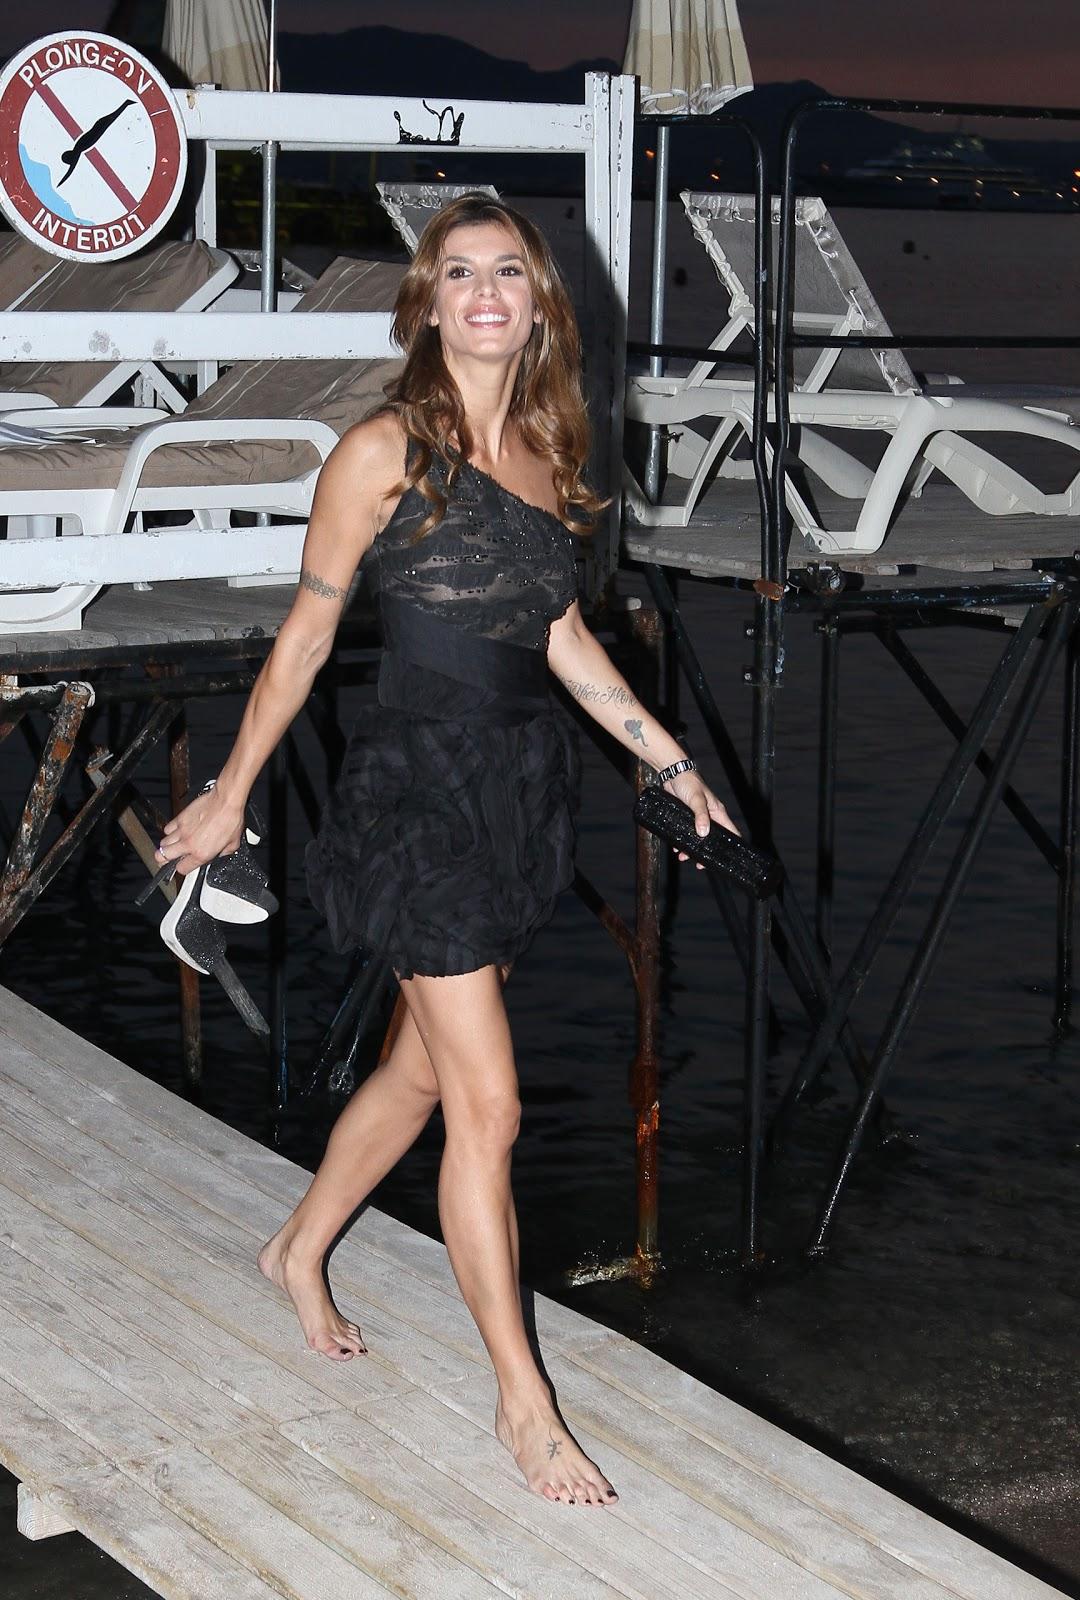 http://3.bp.blogspot.com/-_y5yvtoQZ_k/Ts6t5nNSRiI/AAAAAAAAAXY/ldzxnk1YNRU/s1600/Elisabetta-Canalis-Feet-412107.jpg